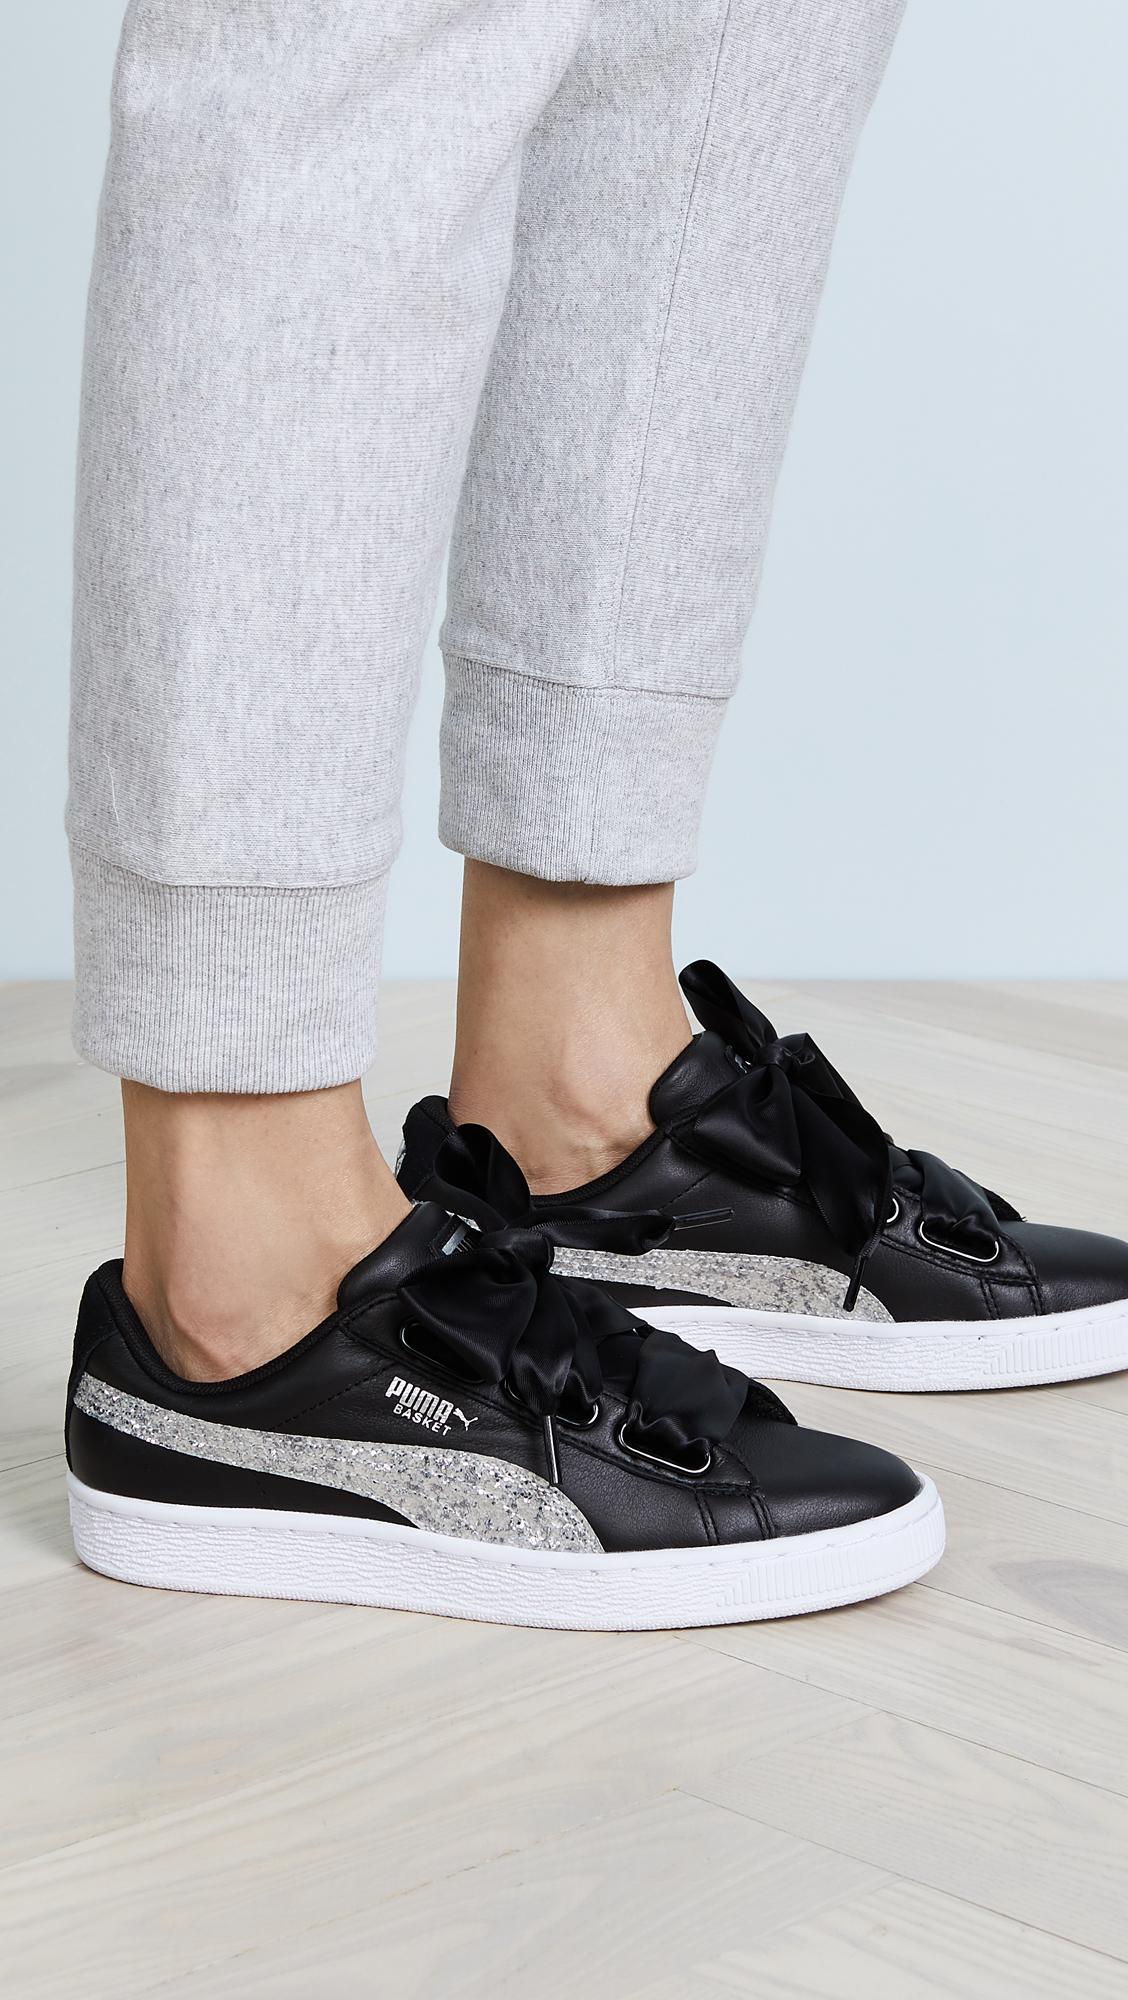 921f93dbe7e9 PUMA Basket Heart Glitter Sneakers | SHOPBOP